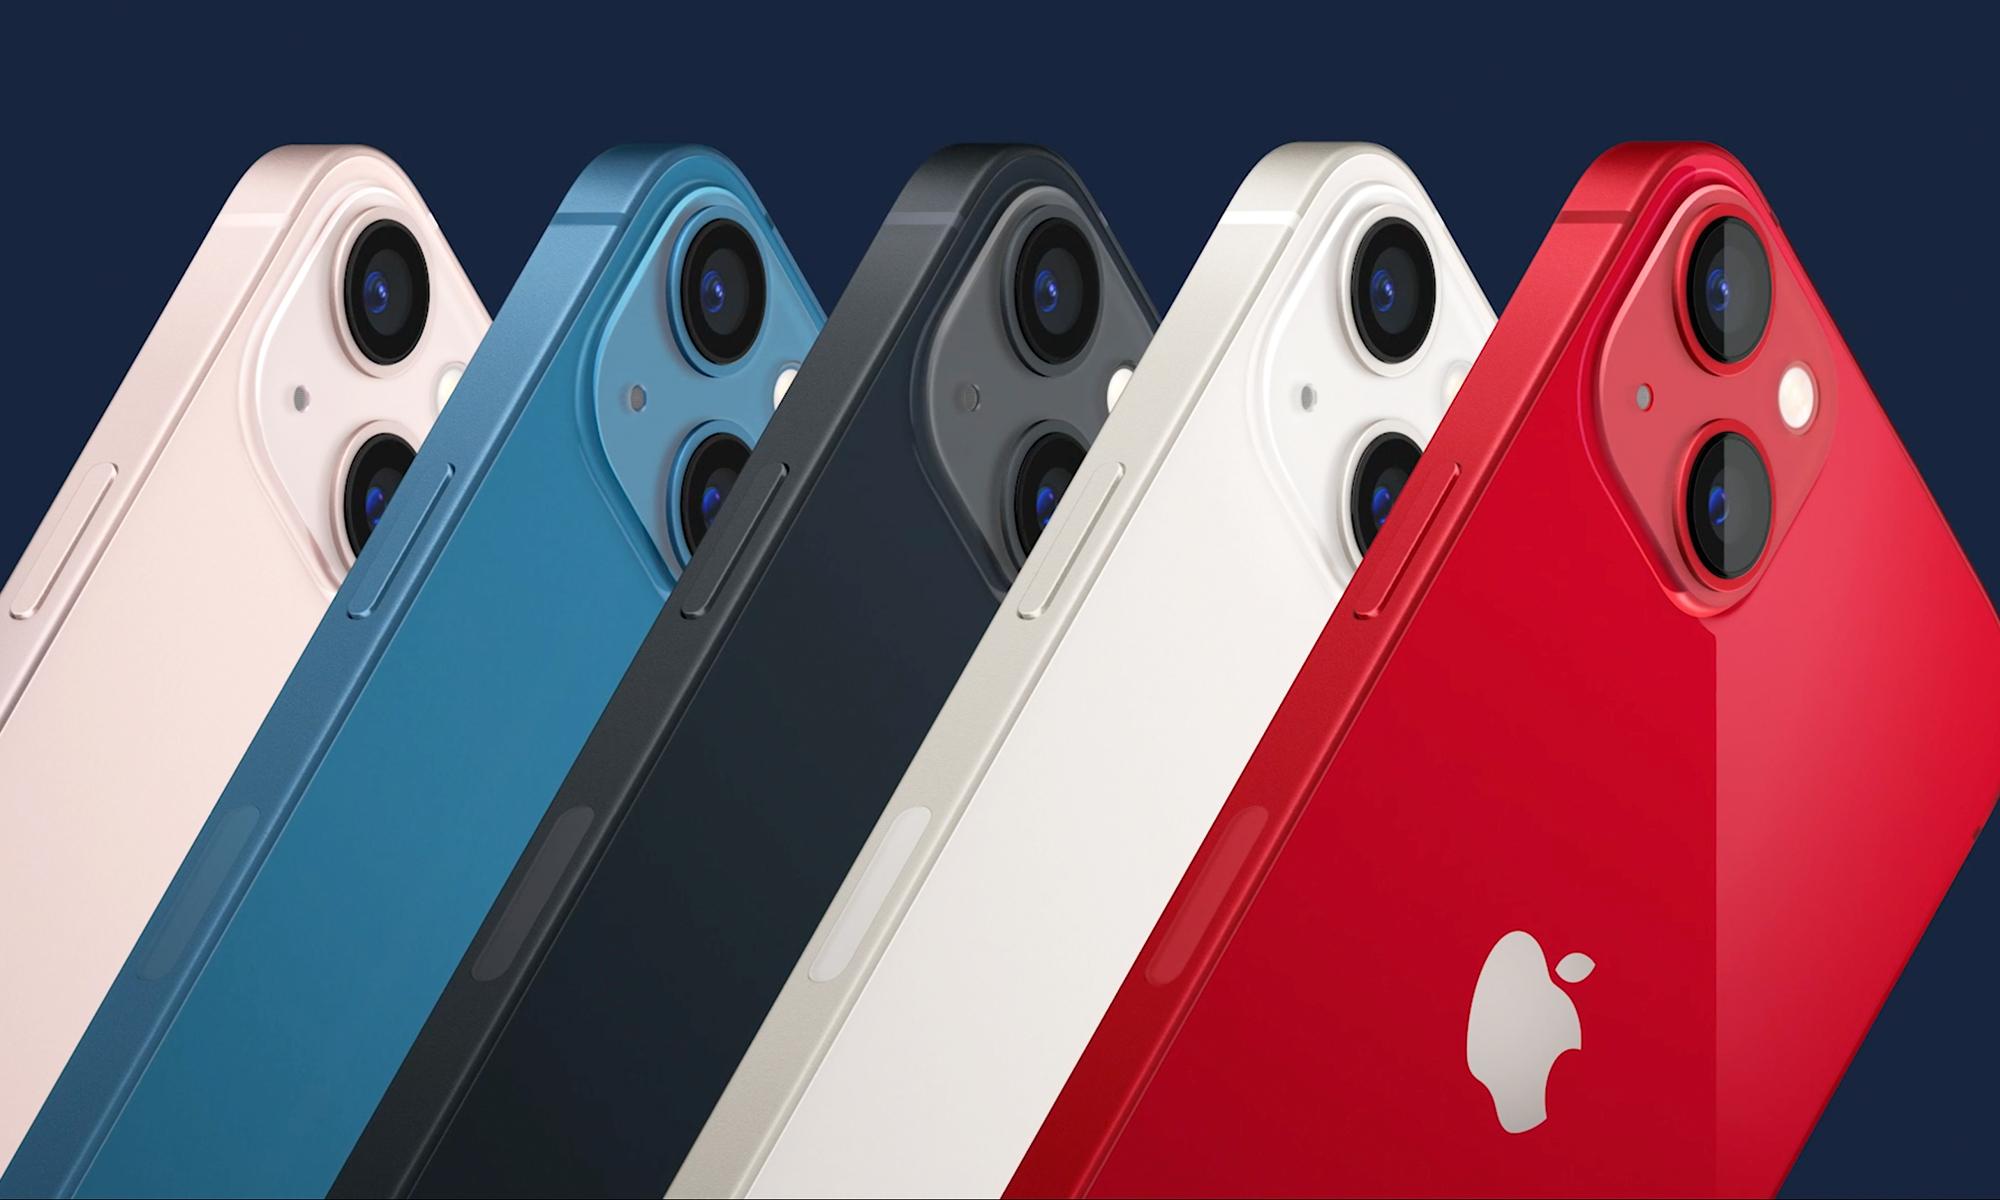 ألوان هاتف ايفون 13 ميني